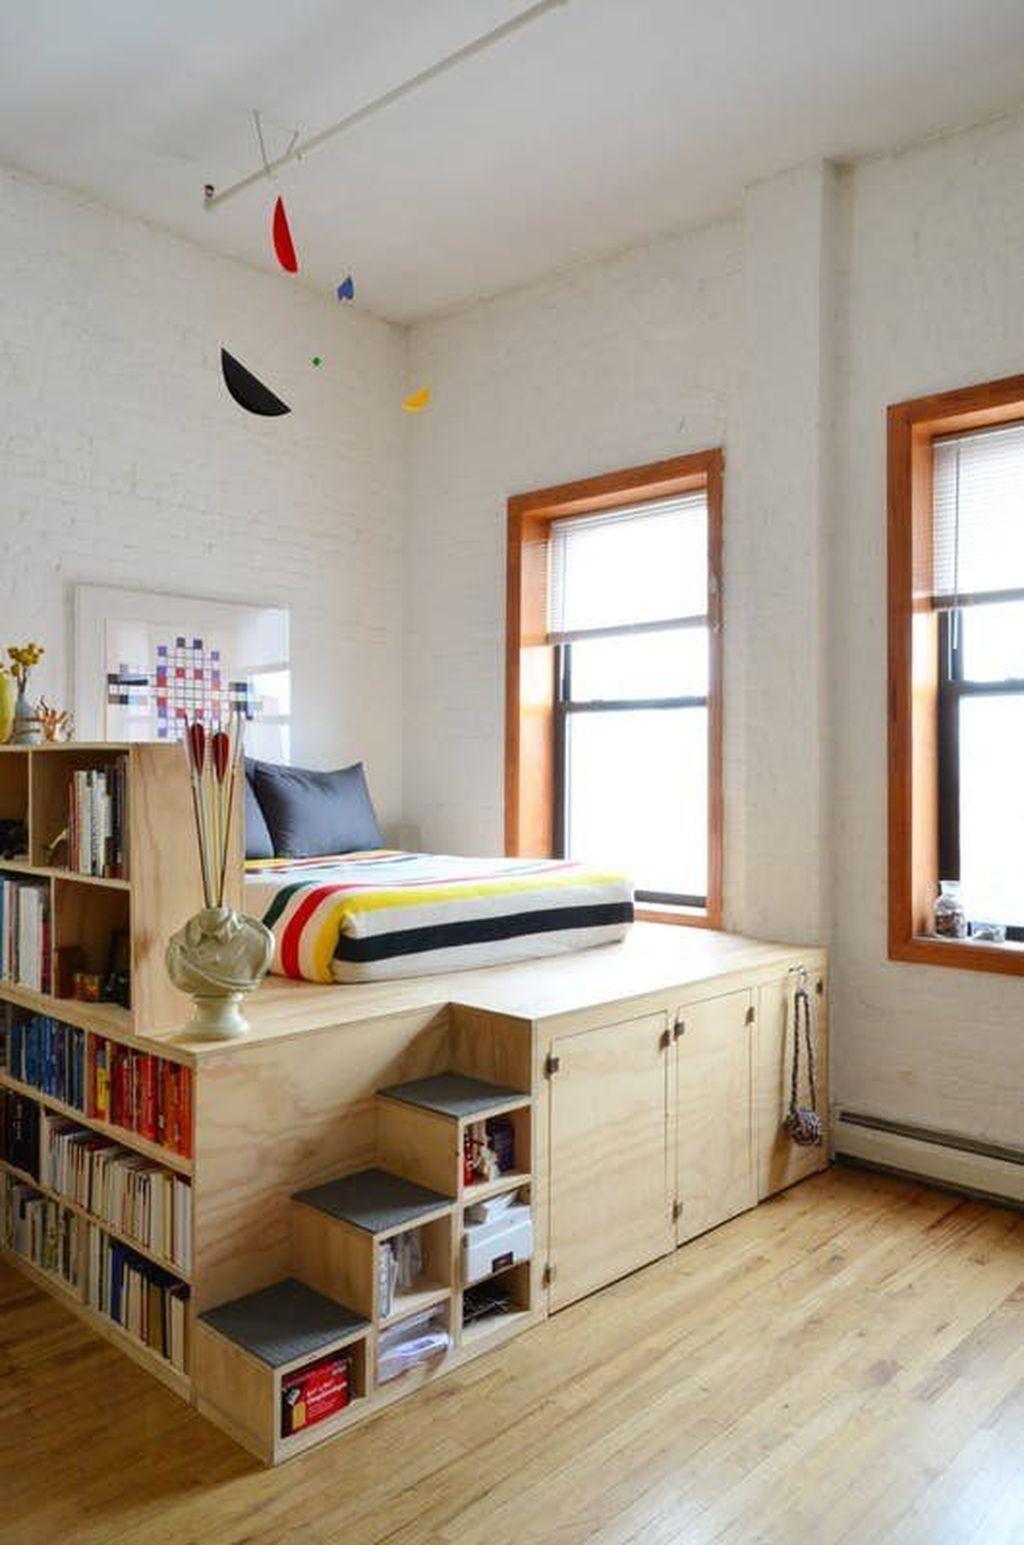 Loft bed design ideas   Space Saving Retractable Loft Beds Design Ideas  Bed design